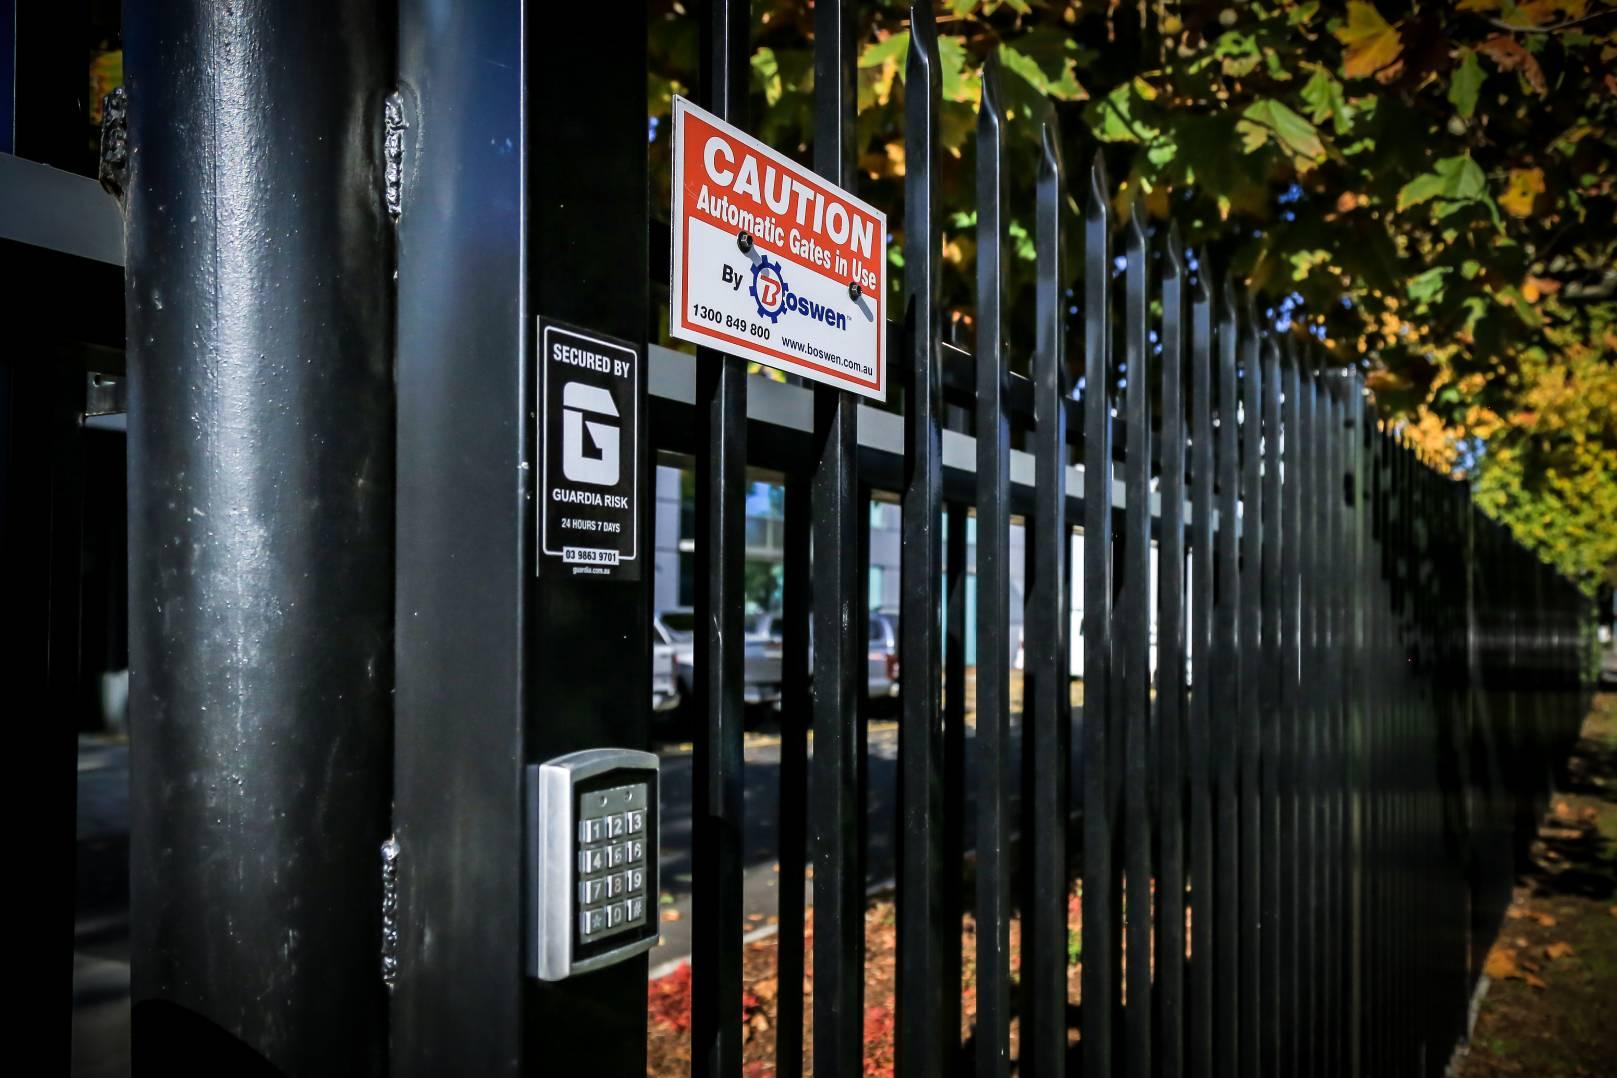 Automatic gates installation services Melbourne - Boswen